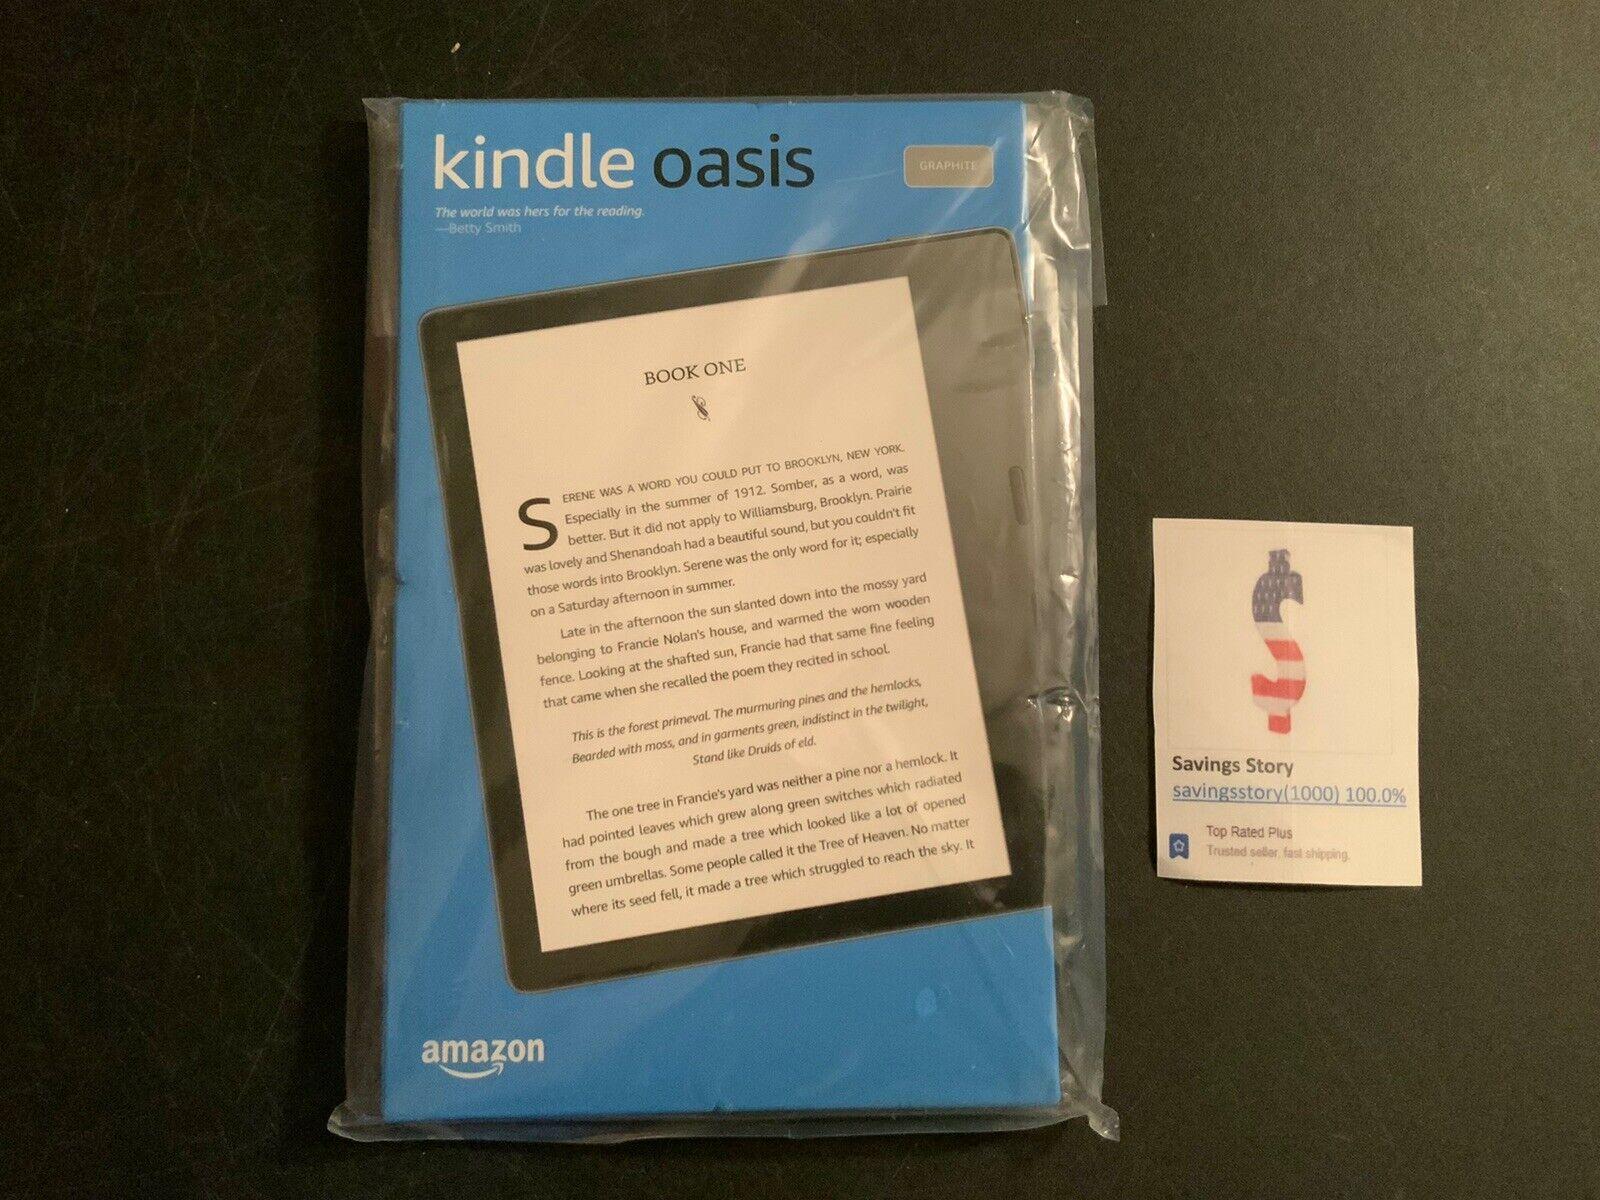 KO3 1 1/2 Waterproof eReader Adjustable Warm Light 32 GB Amazon. Buy it now for 420.00